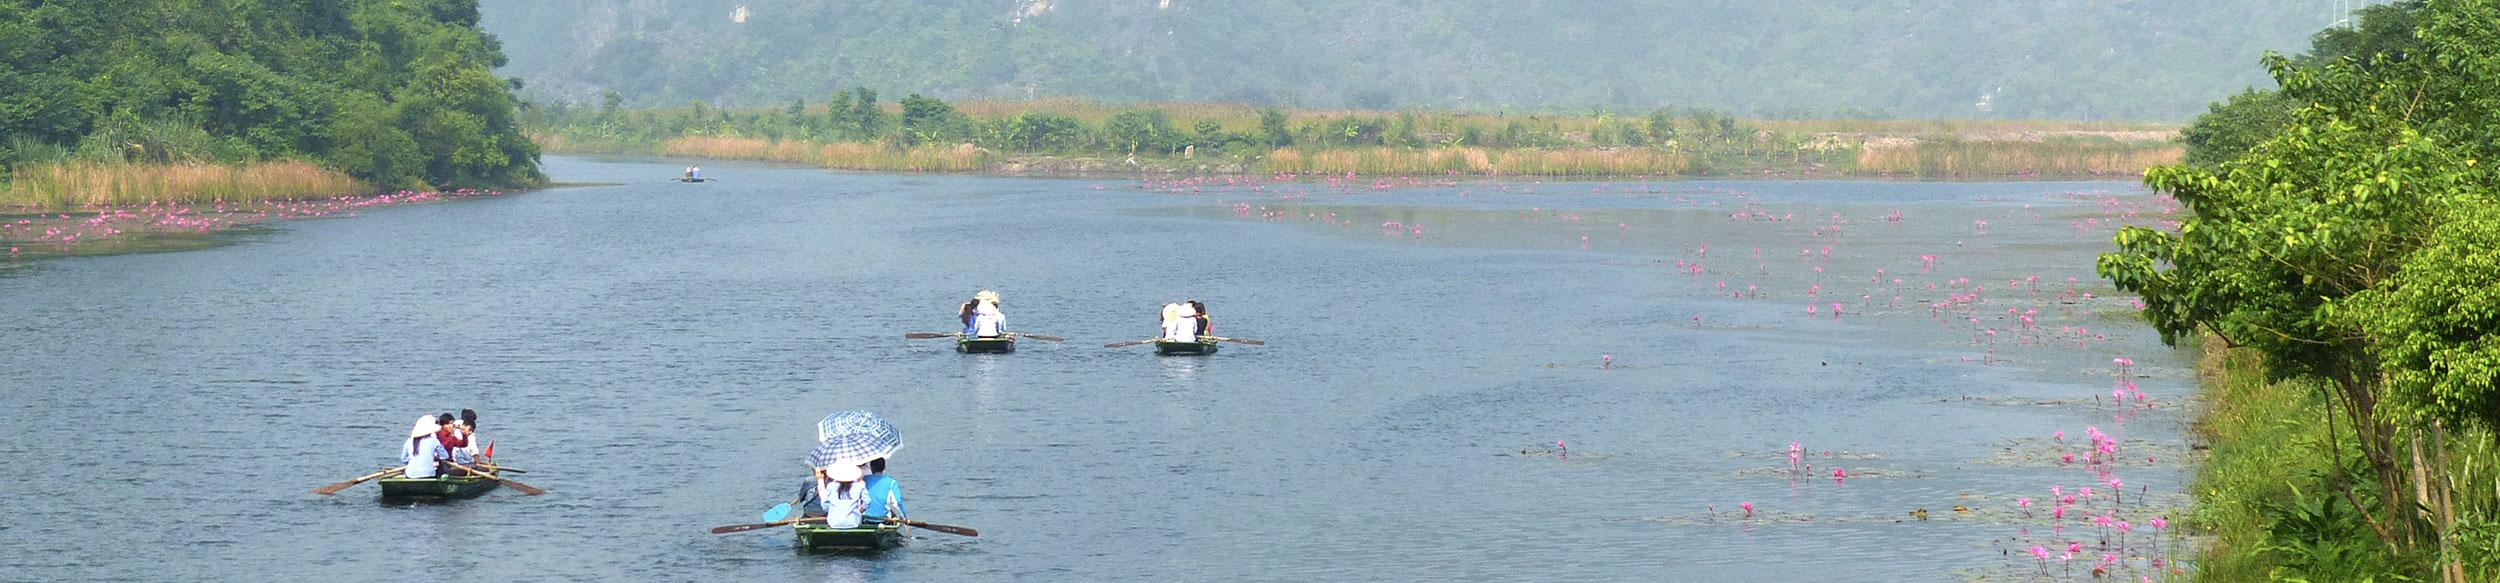 Promenade en barque à rame à Trang An